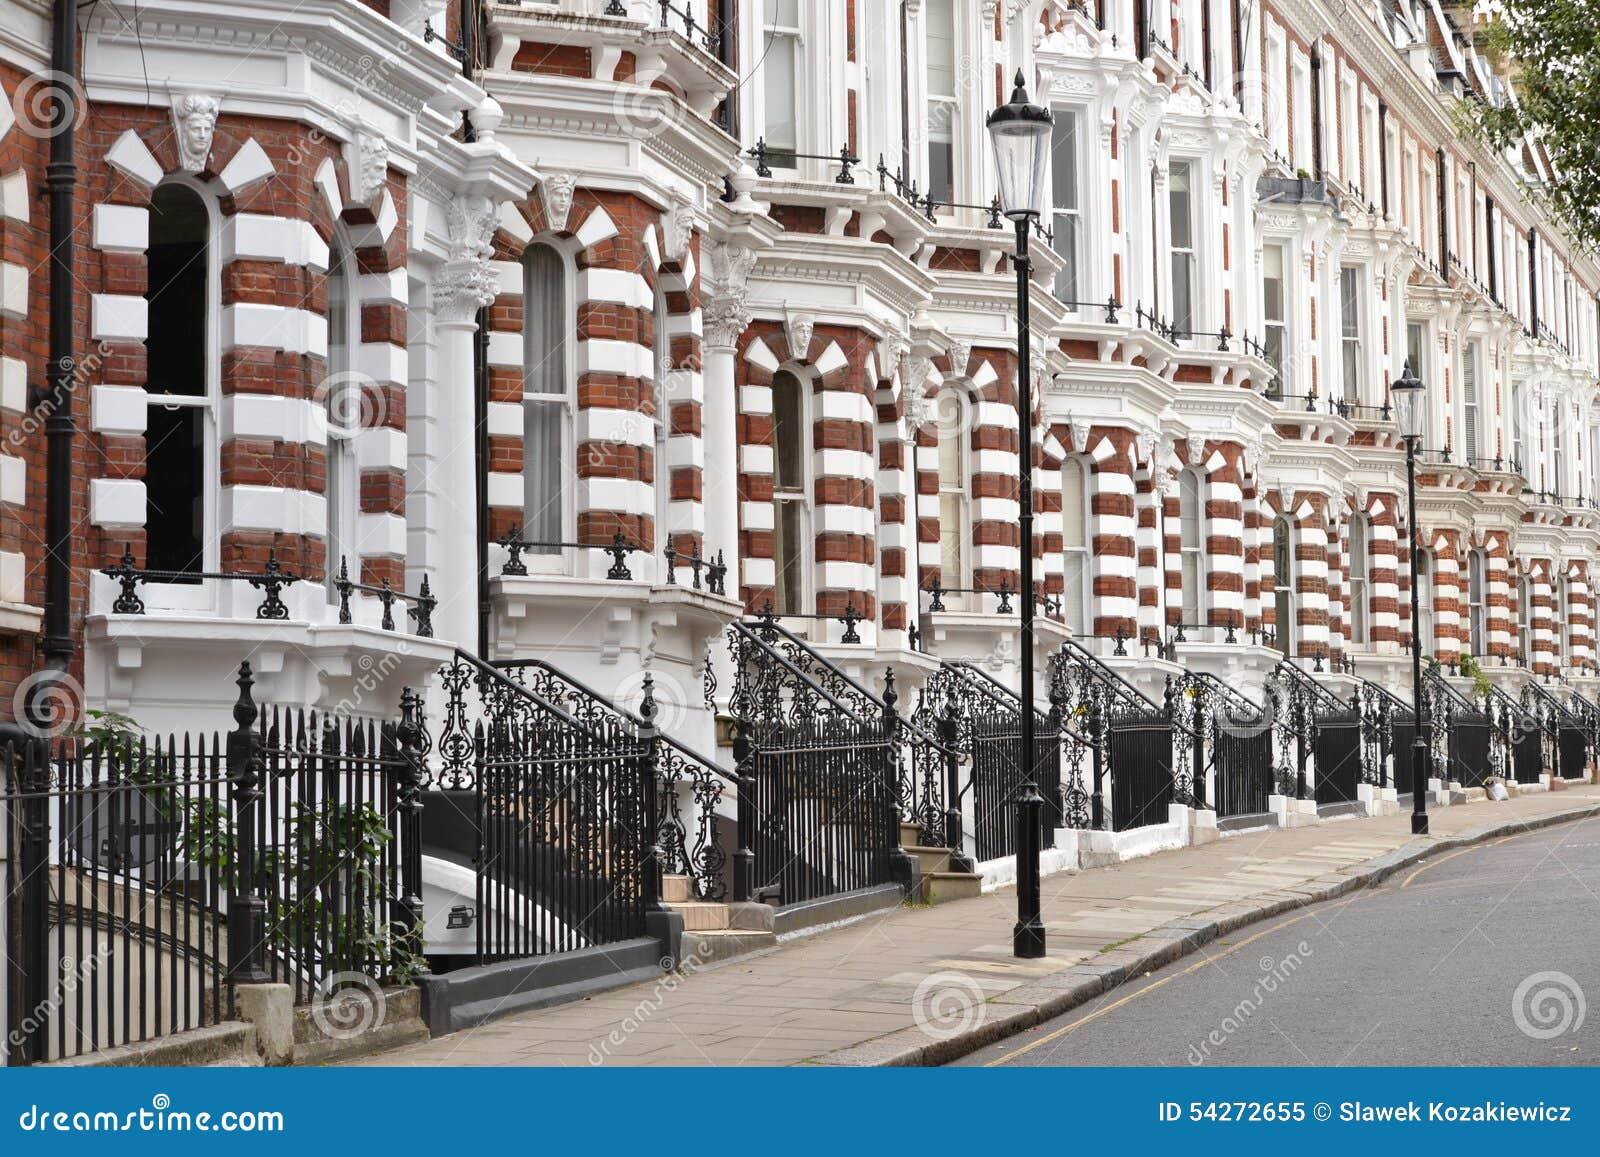 gehobene london h user stockfoto bild 54272655. Black Bedroom Furniture Sets. Home Design Ideas